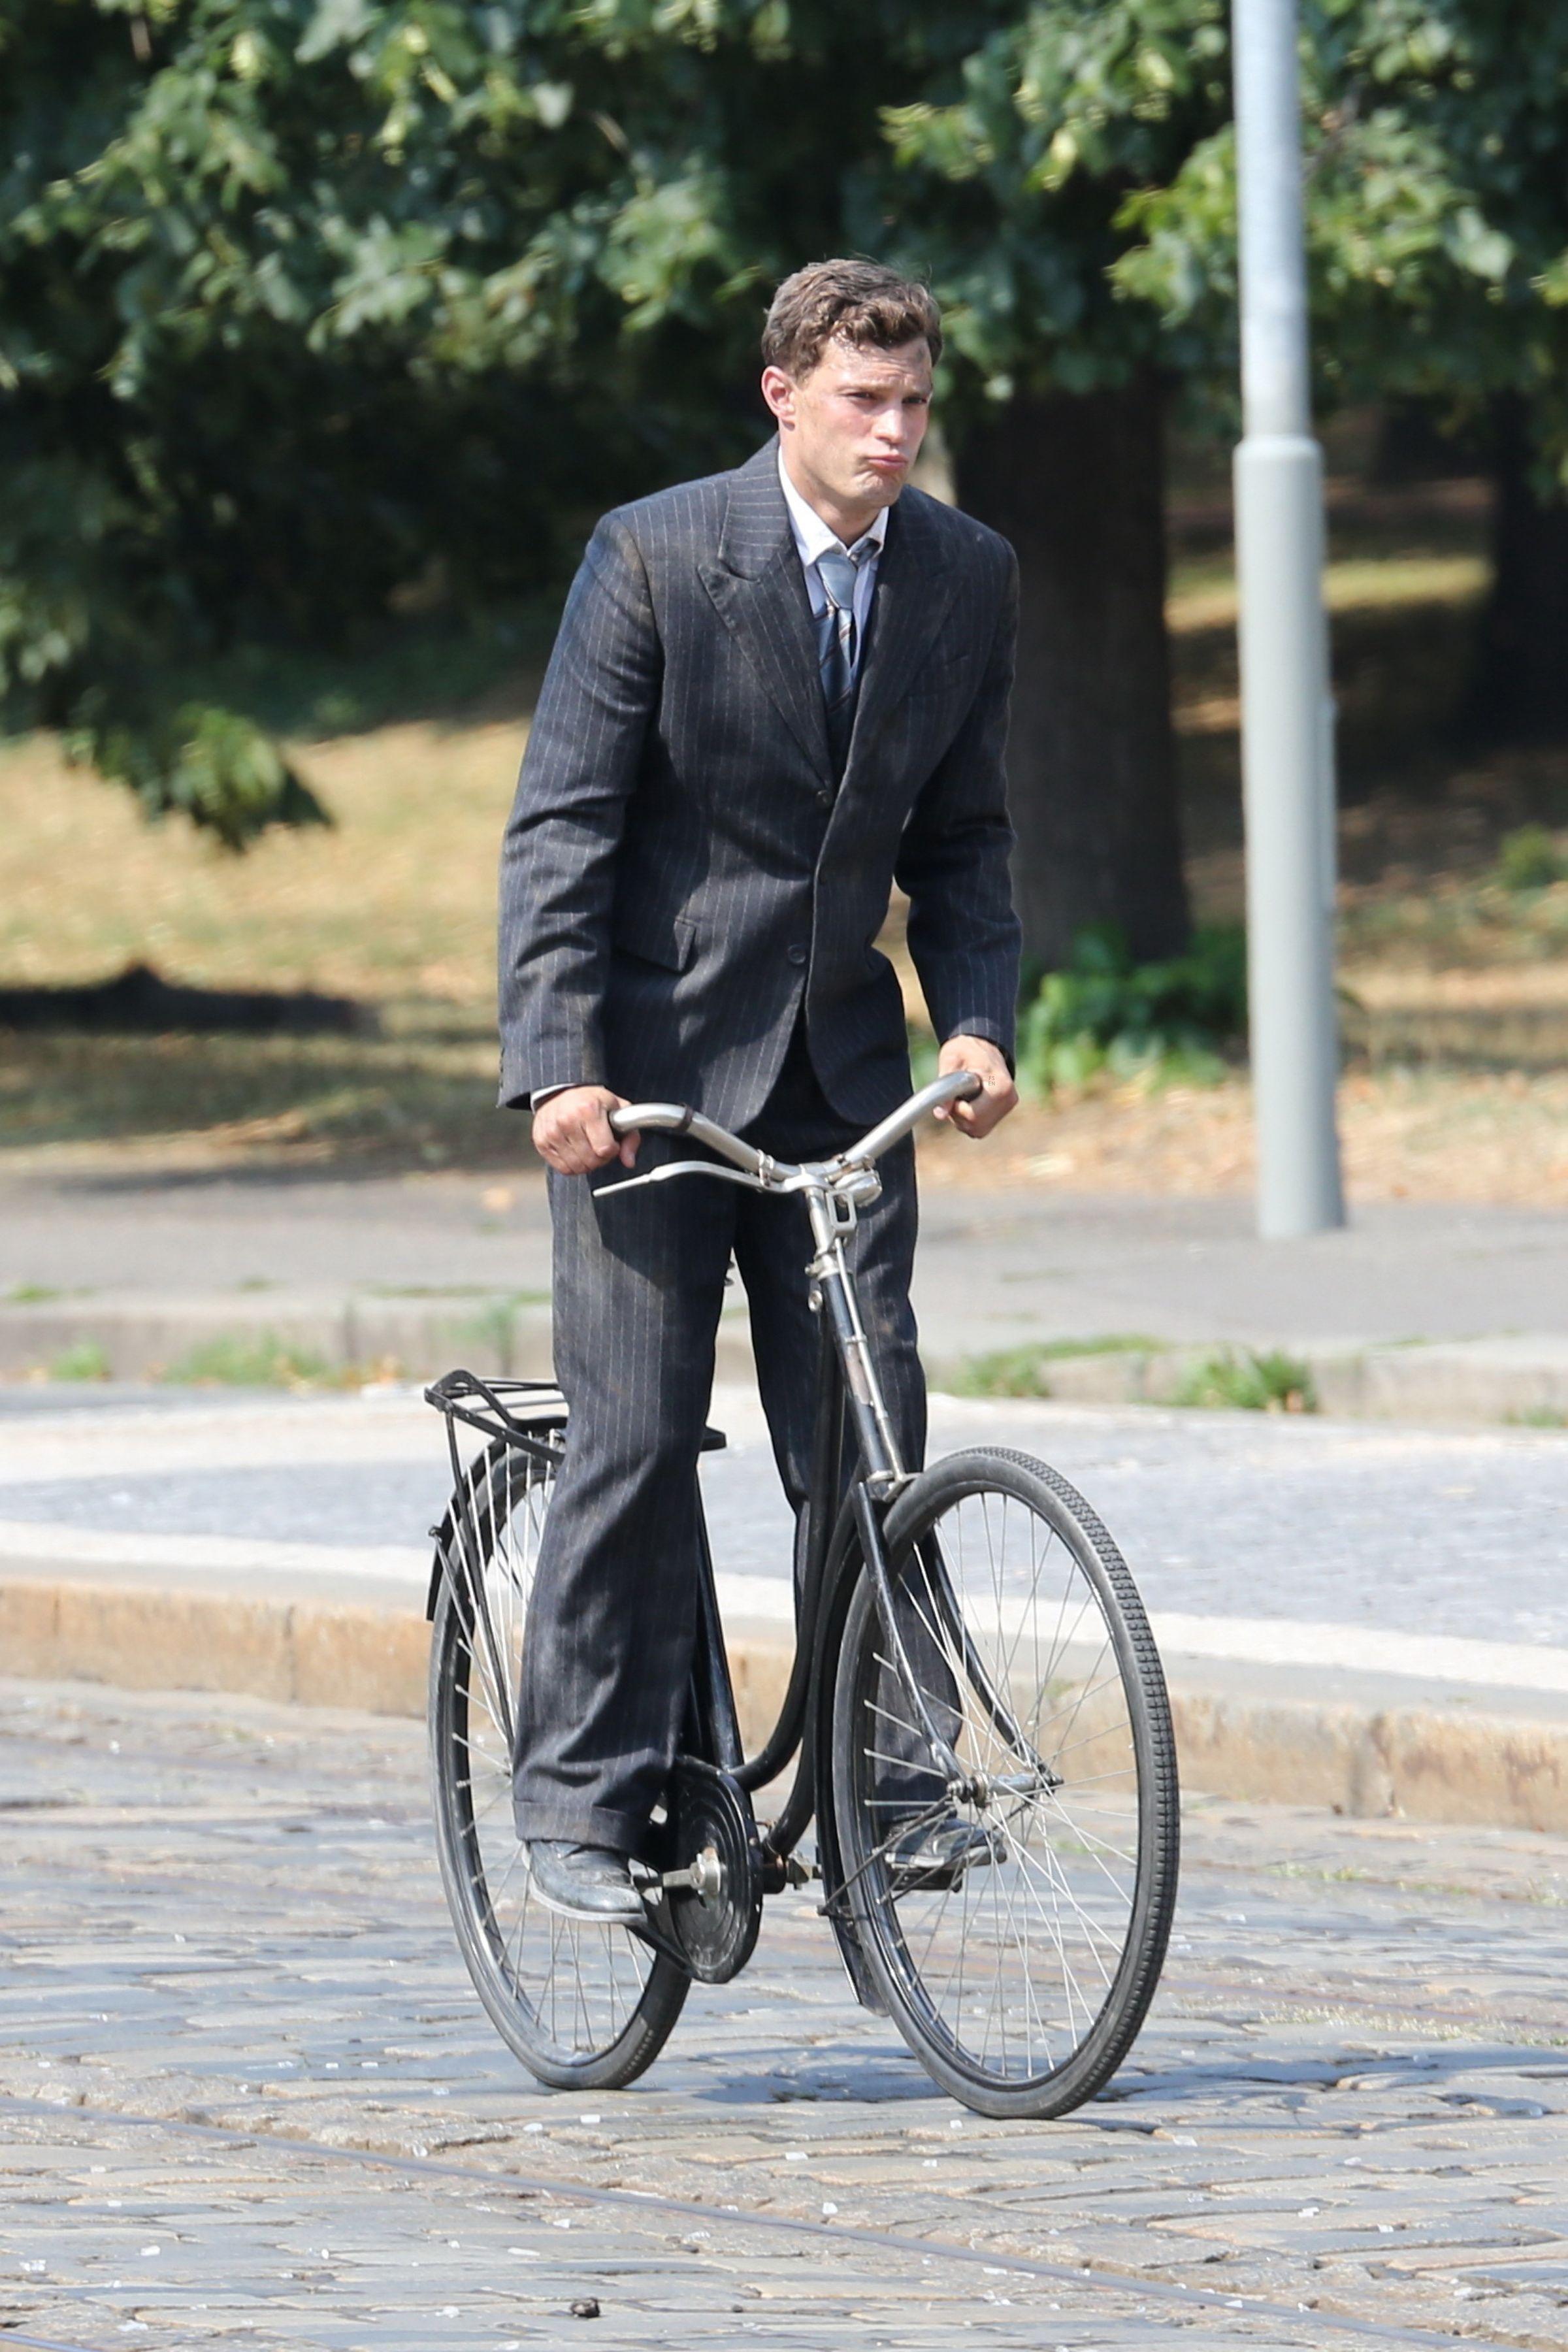 Jamie Dornan on Set of ANTHROPOID - 3 Aug - Trailer Online Scenes Set 2017 -